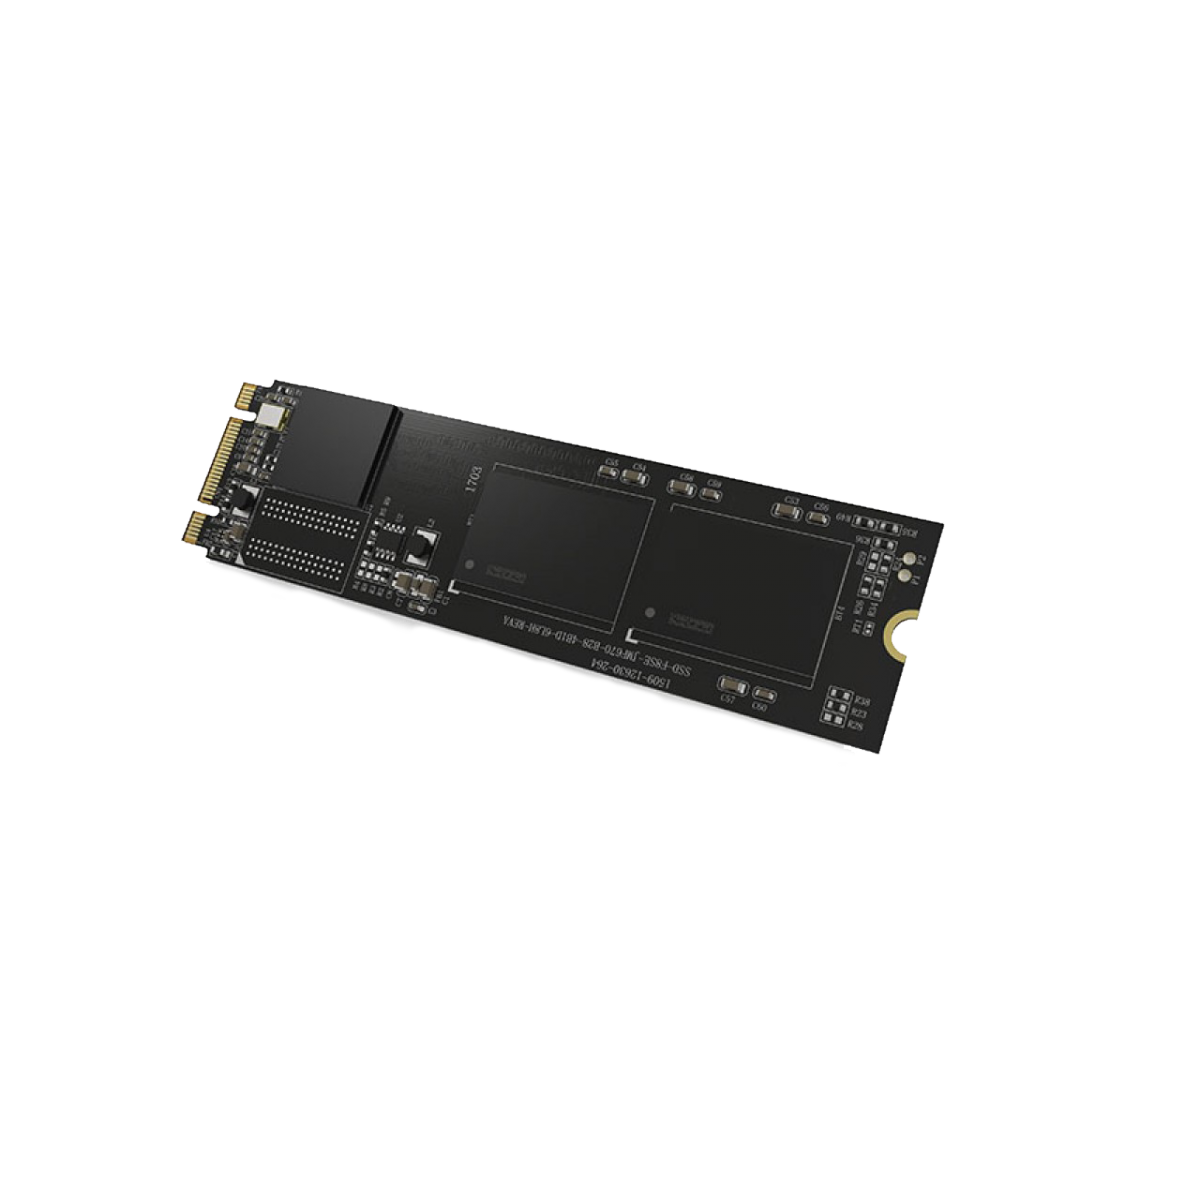 SSD Hikvision E100N 1TB, M.2 2280, Leitura 555MBs e Gravação 513MBs, HS-SSD-E100N-1024GB